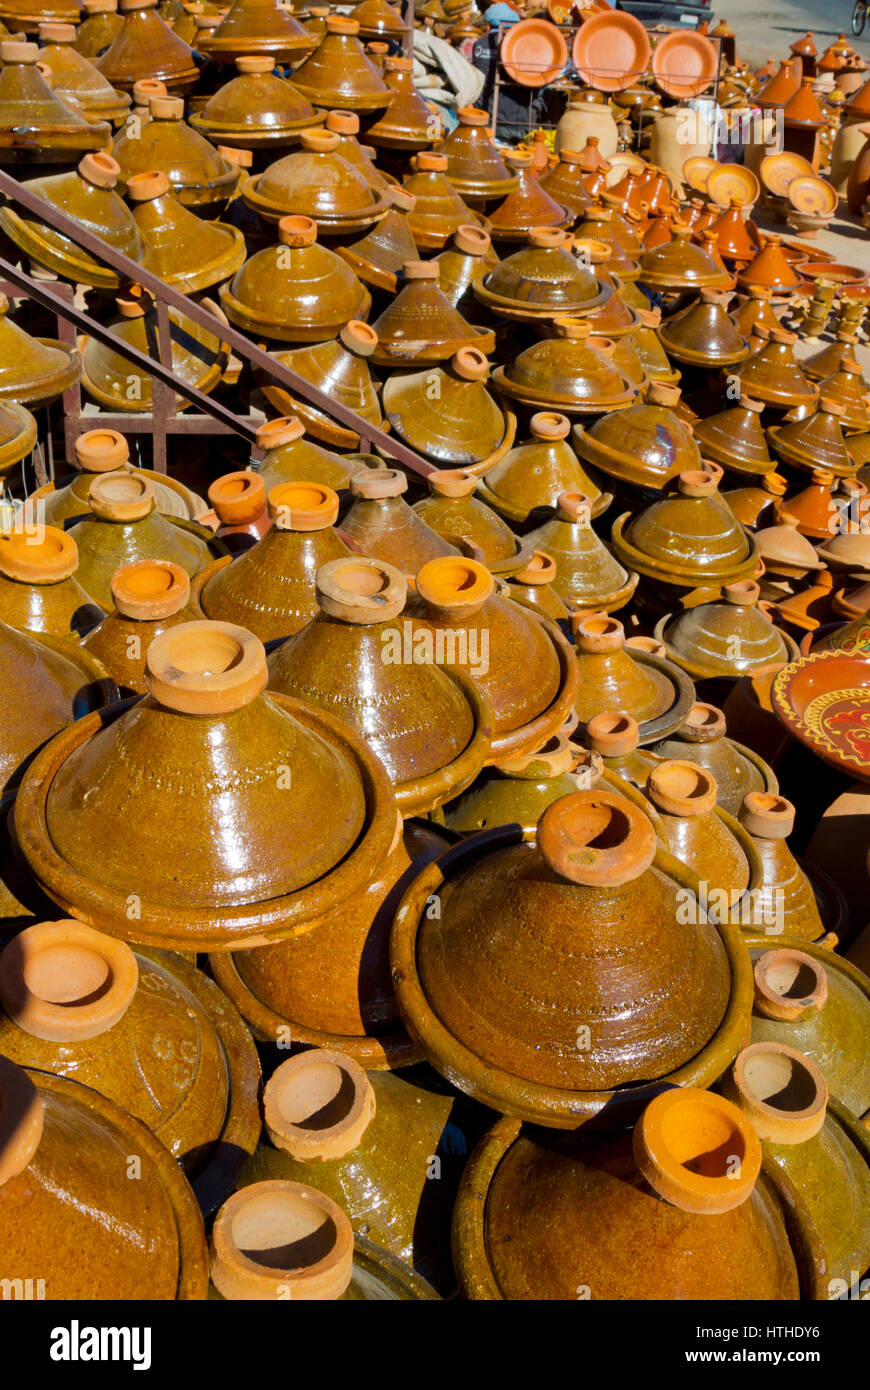 moroccan tagine pots stockfotos moroccan tagine pots bilder alamy. Black Bedroom Furniture Sets. Home Design Ideas